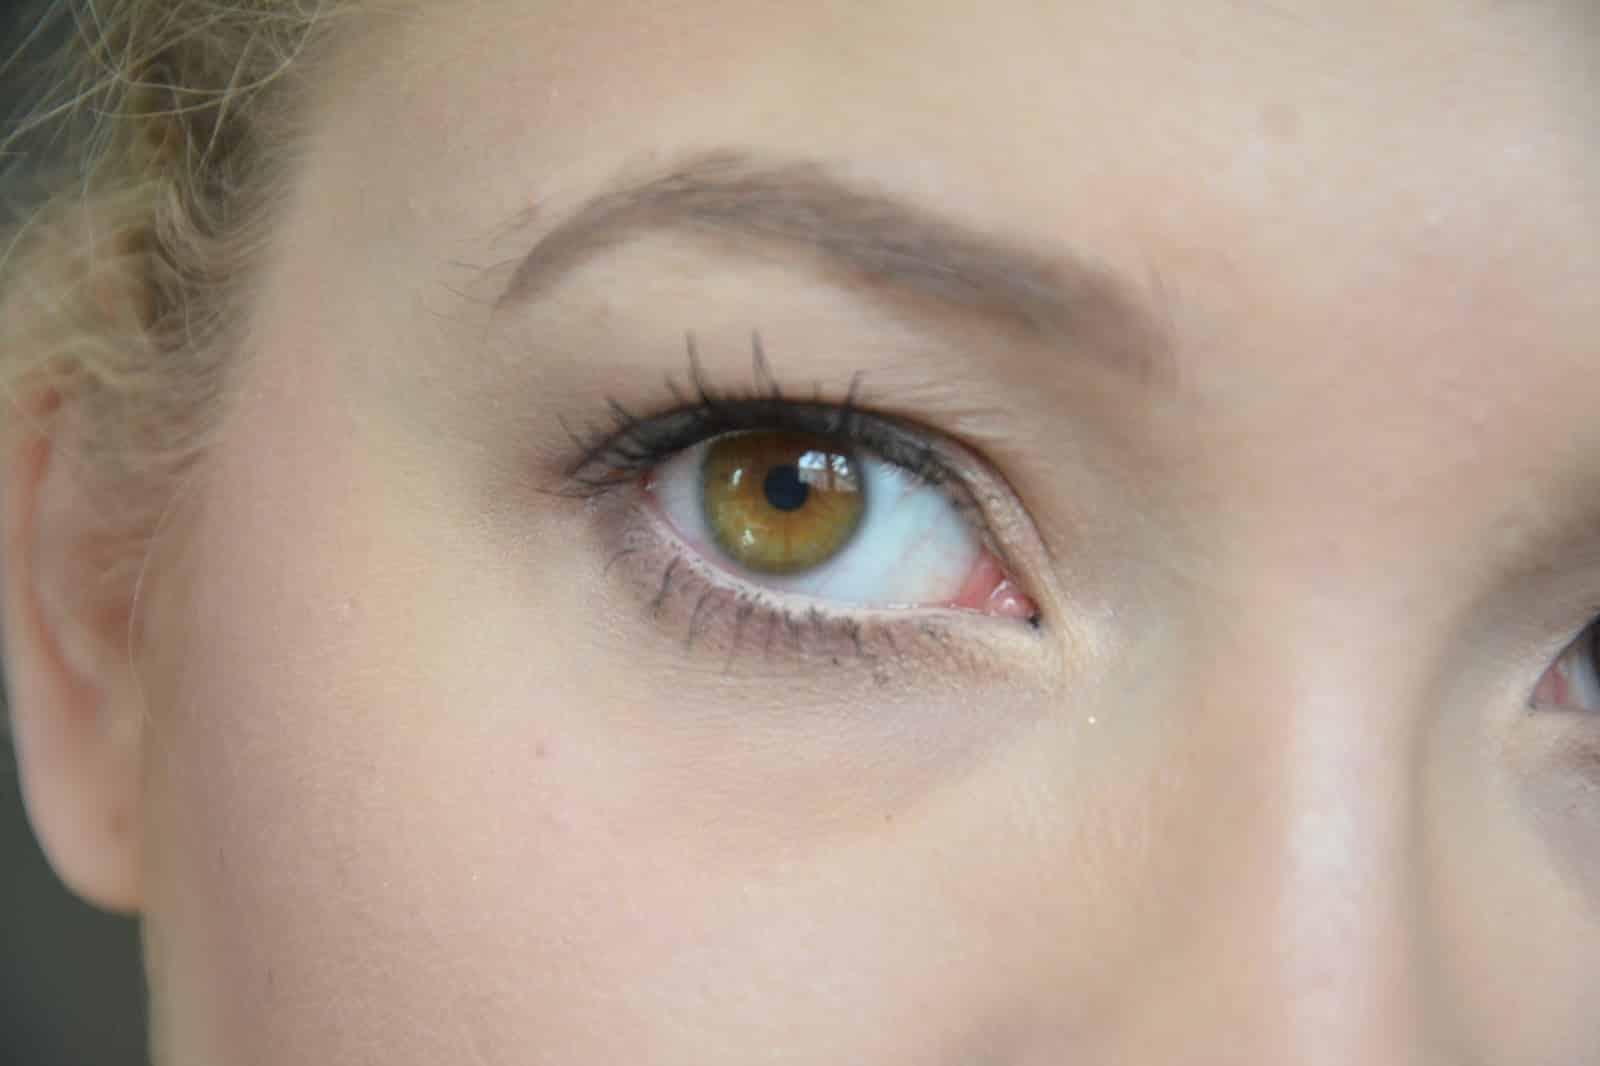 Lentilles : concernant les lentilles